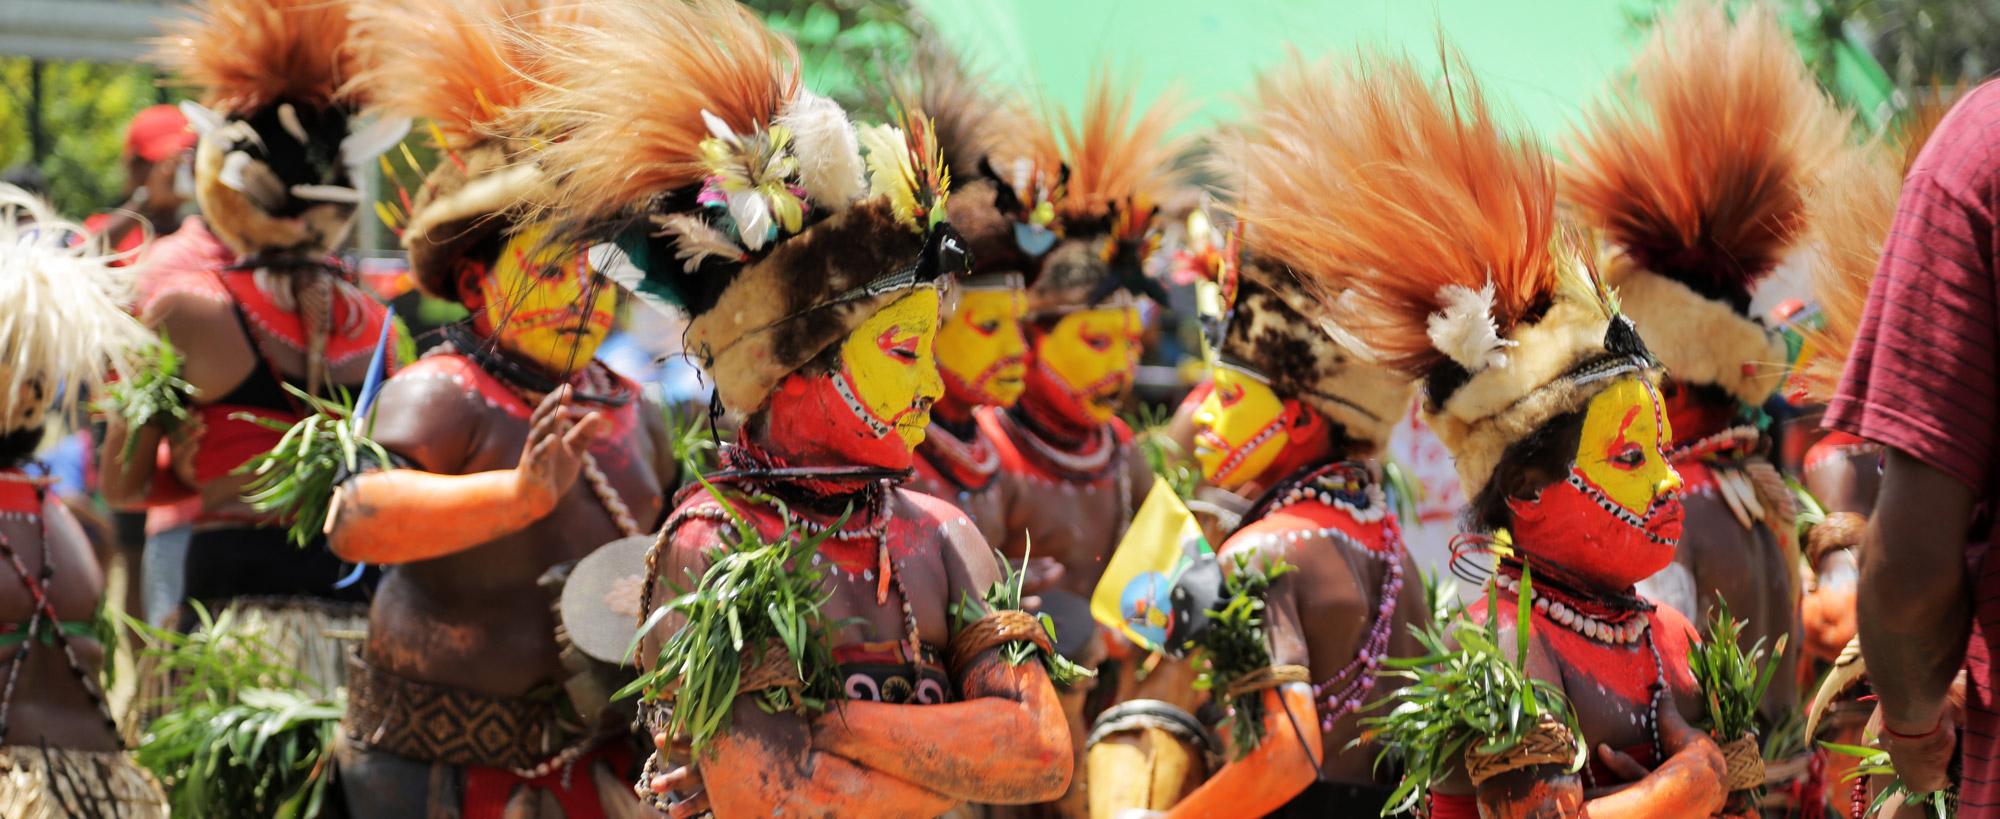 financial-reports-children-in-native-dress-crop2